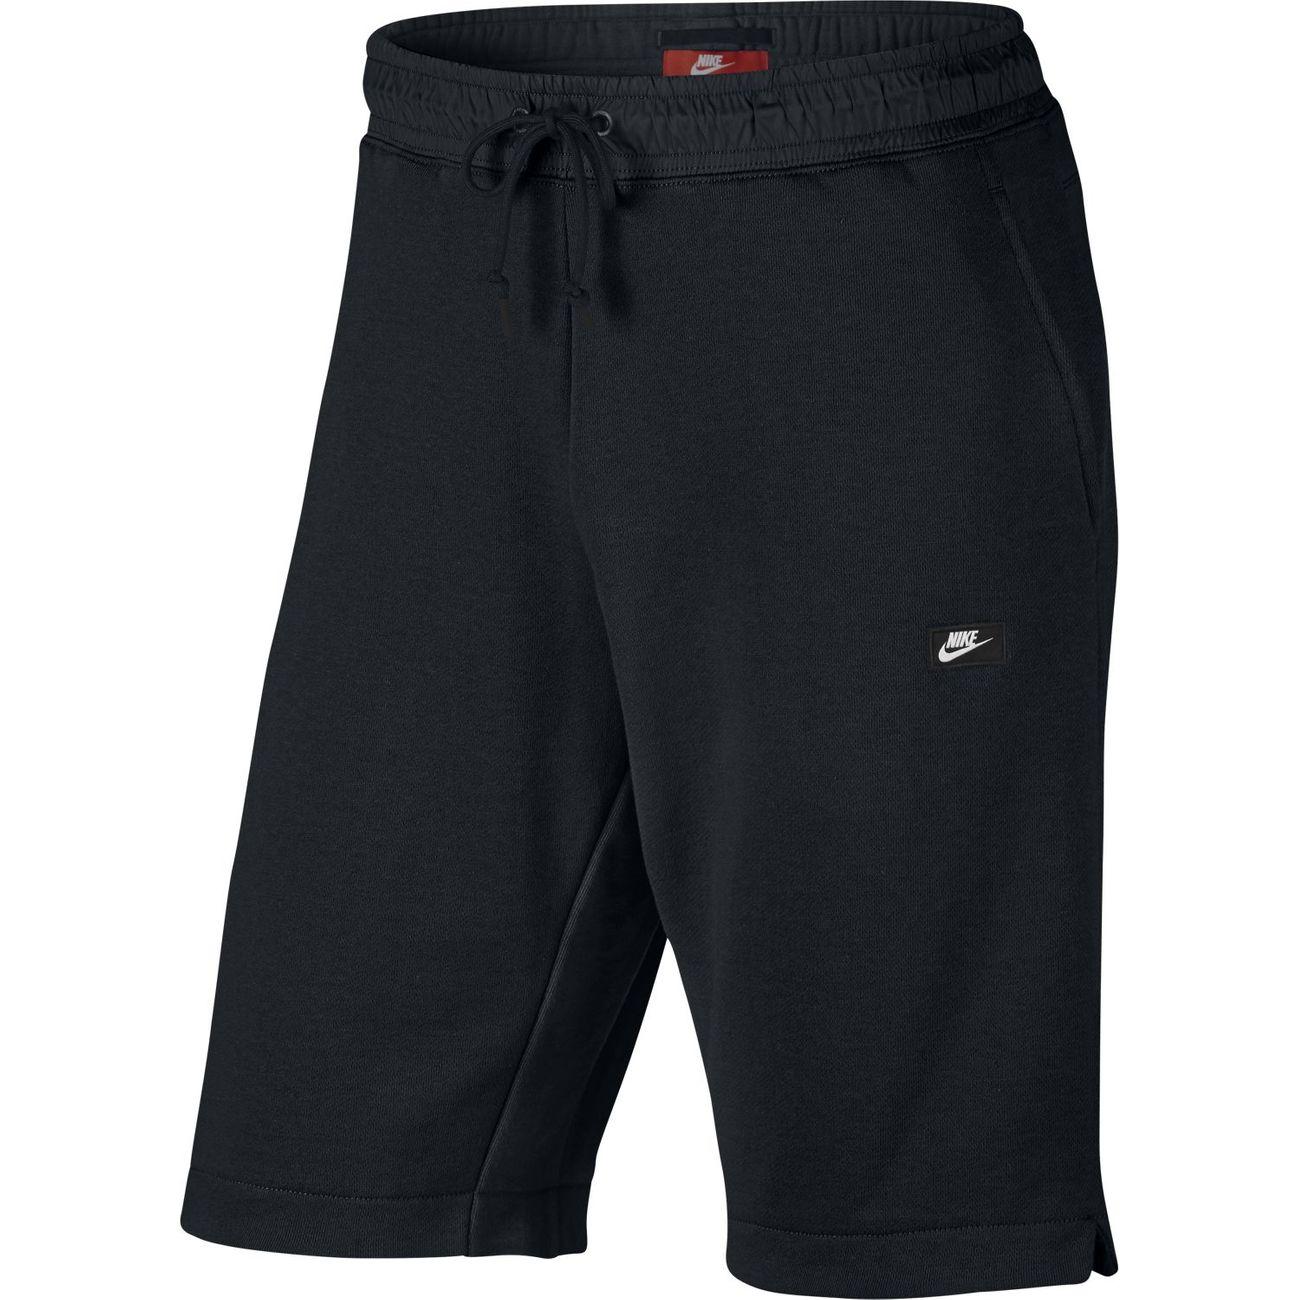 sale quality design sneakers Nike Short Nsw Modern Noir Short Court Homme Multisports ...